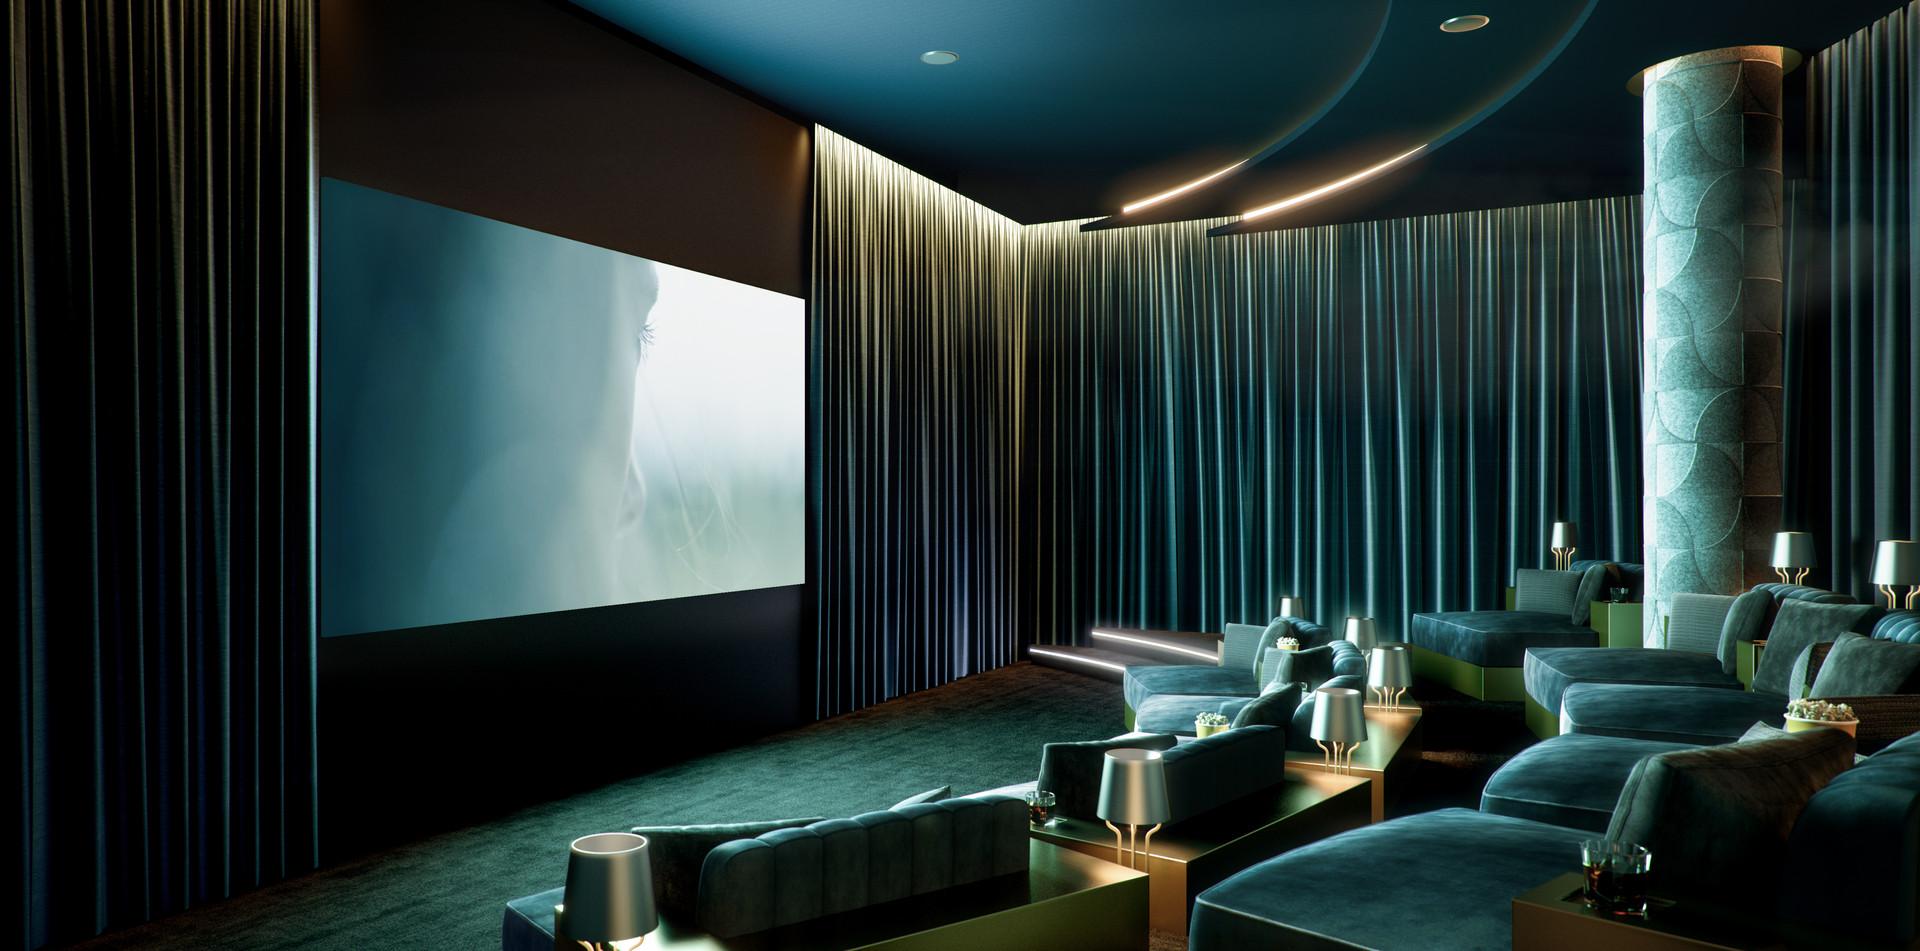 EI_Infinity Tower_Cinema_170901.jpg